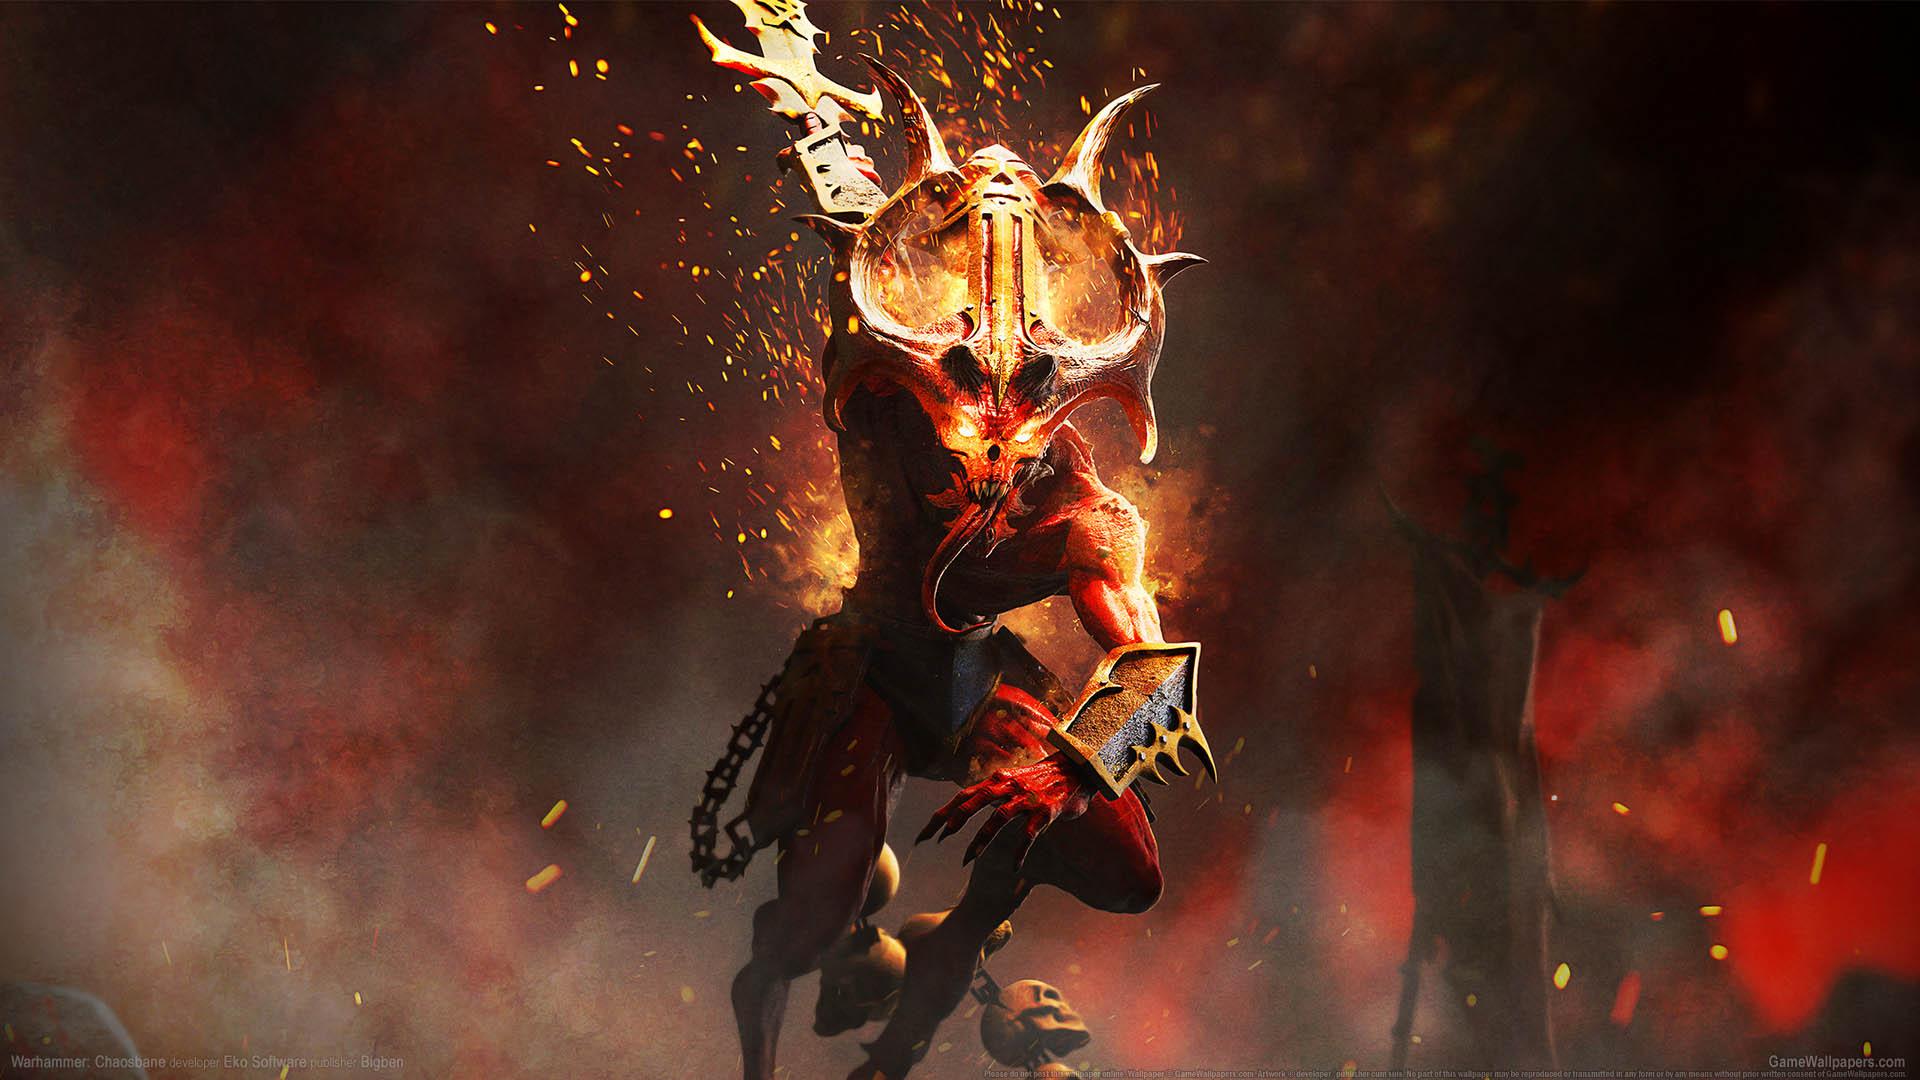 Warhammer: Chaosbane wallpaper 02 1920x1080